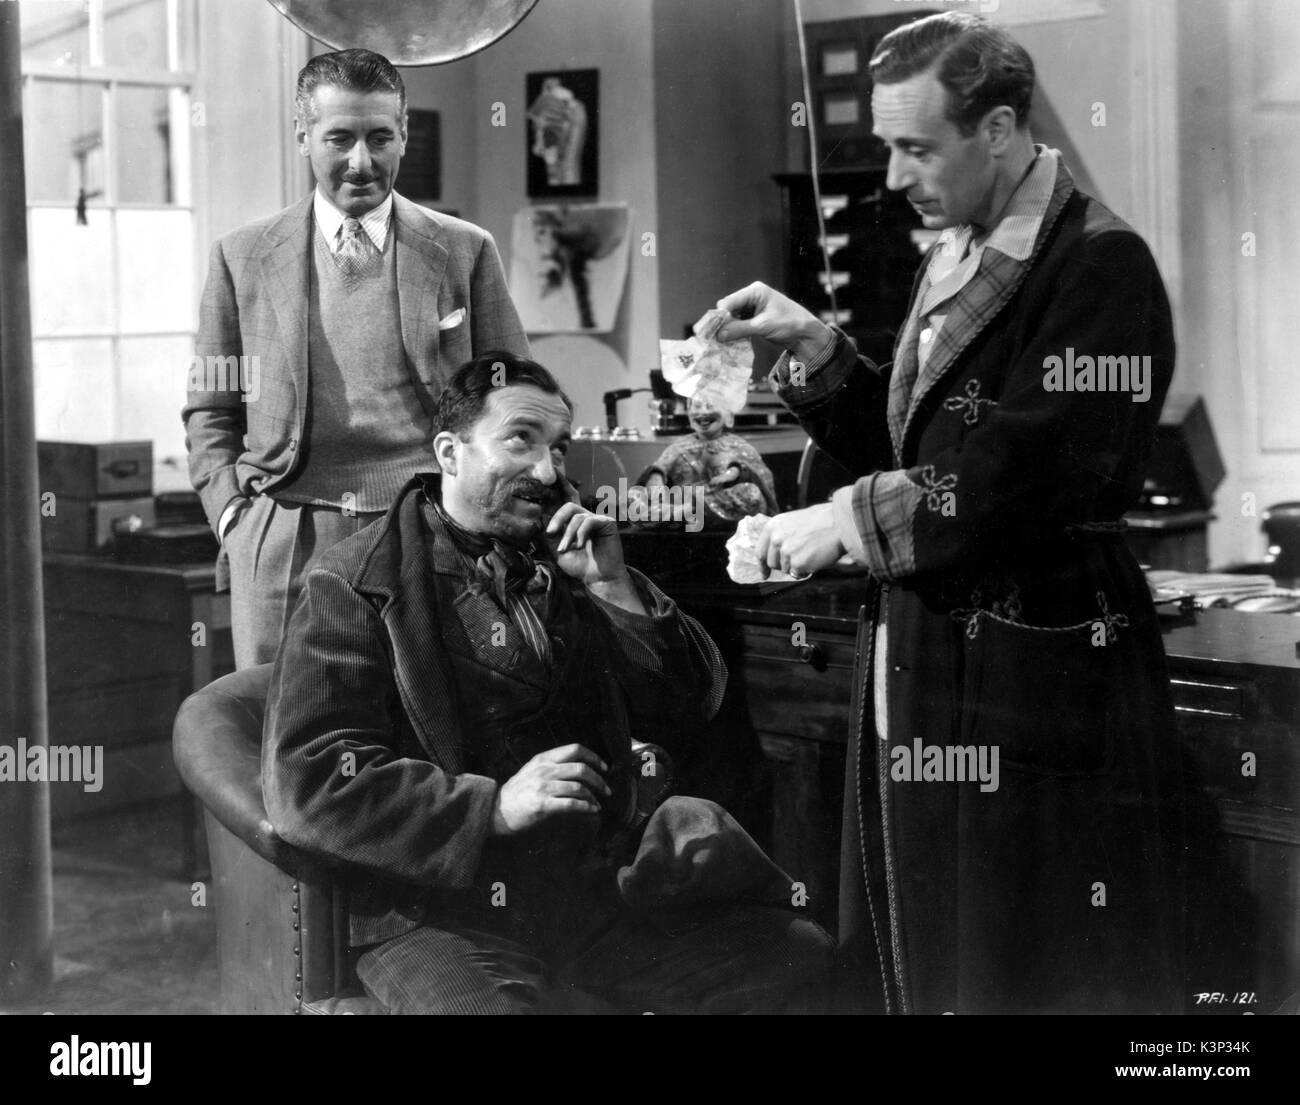 PYGMALION [BR 1938] SCOTT SUNDERLAND as Colonel Pickering, WILFRID LAWSON as Arthur Doolittle, LESLIE HOWARD as Professor Henry Higgins     Date: 1938 - Stock Image